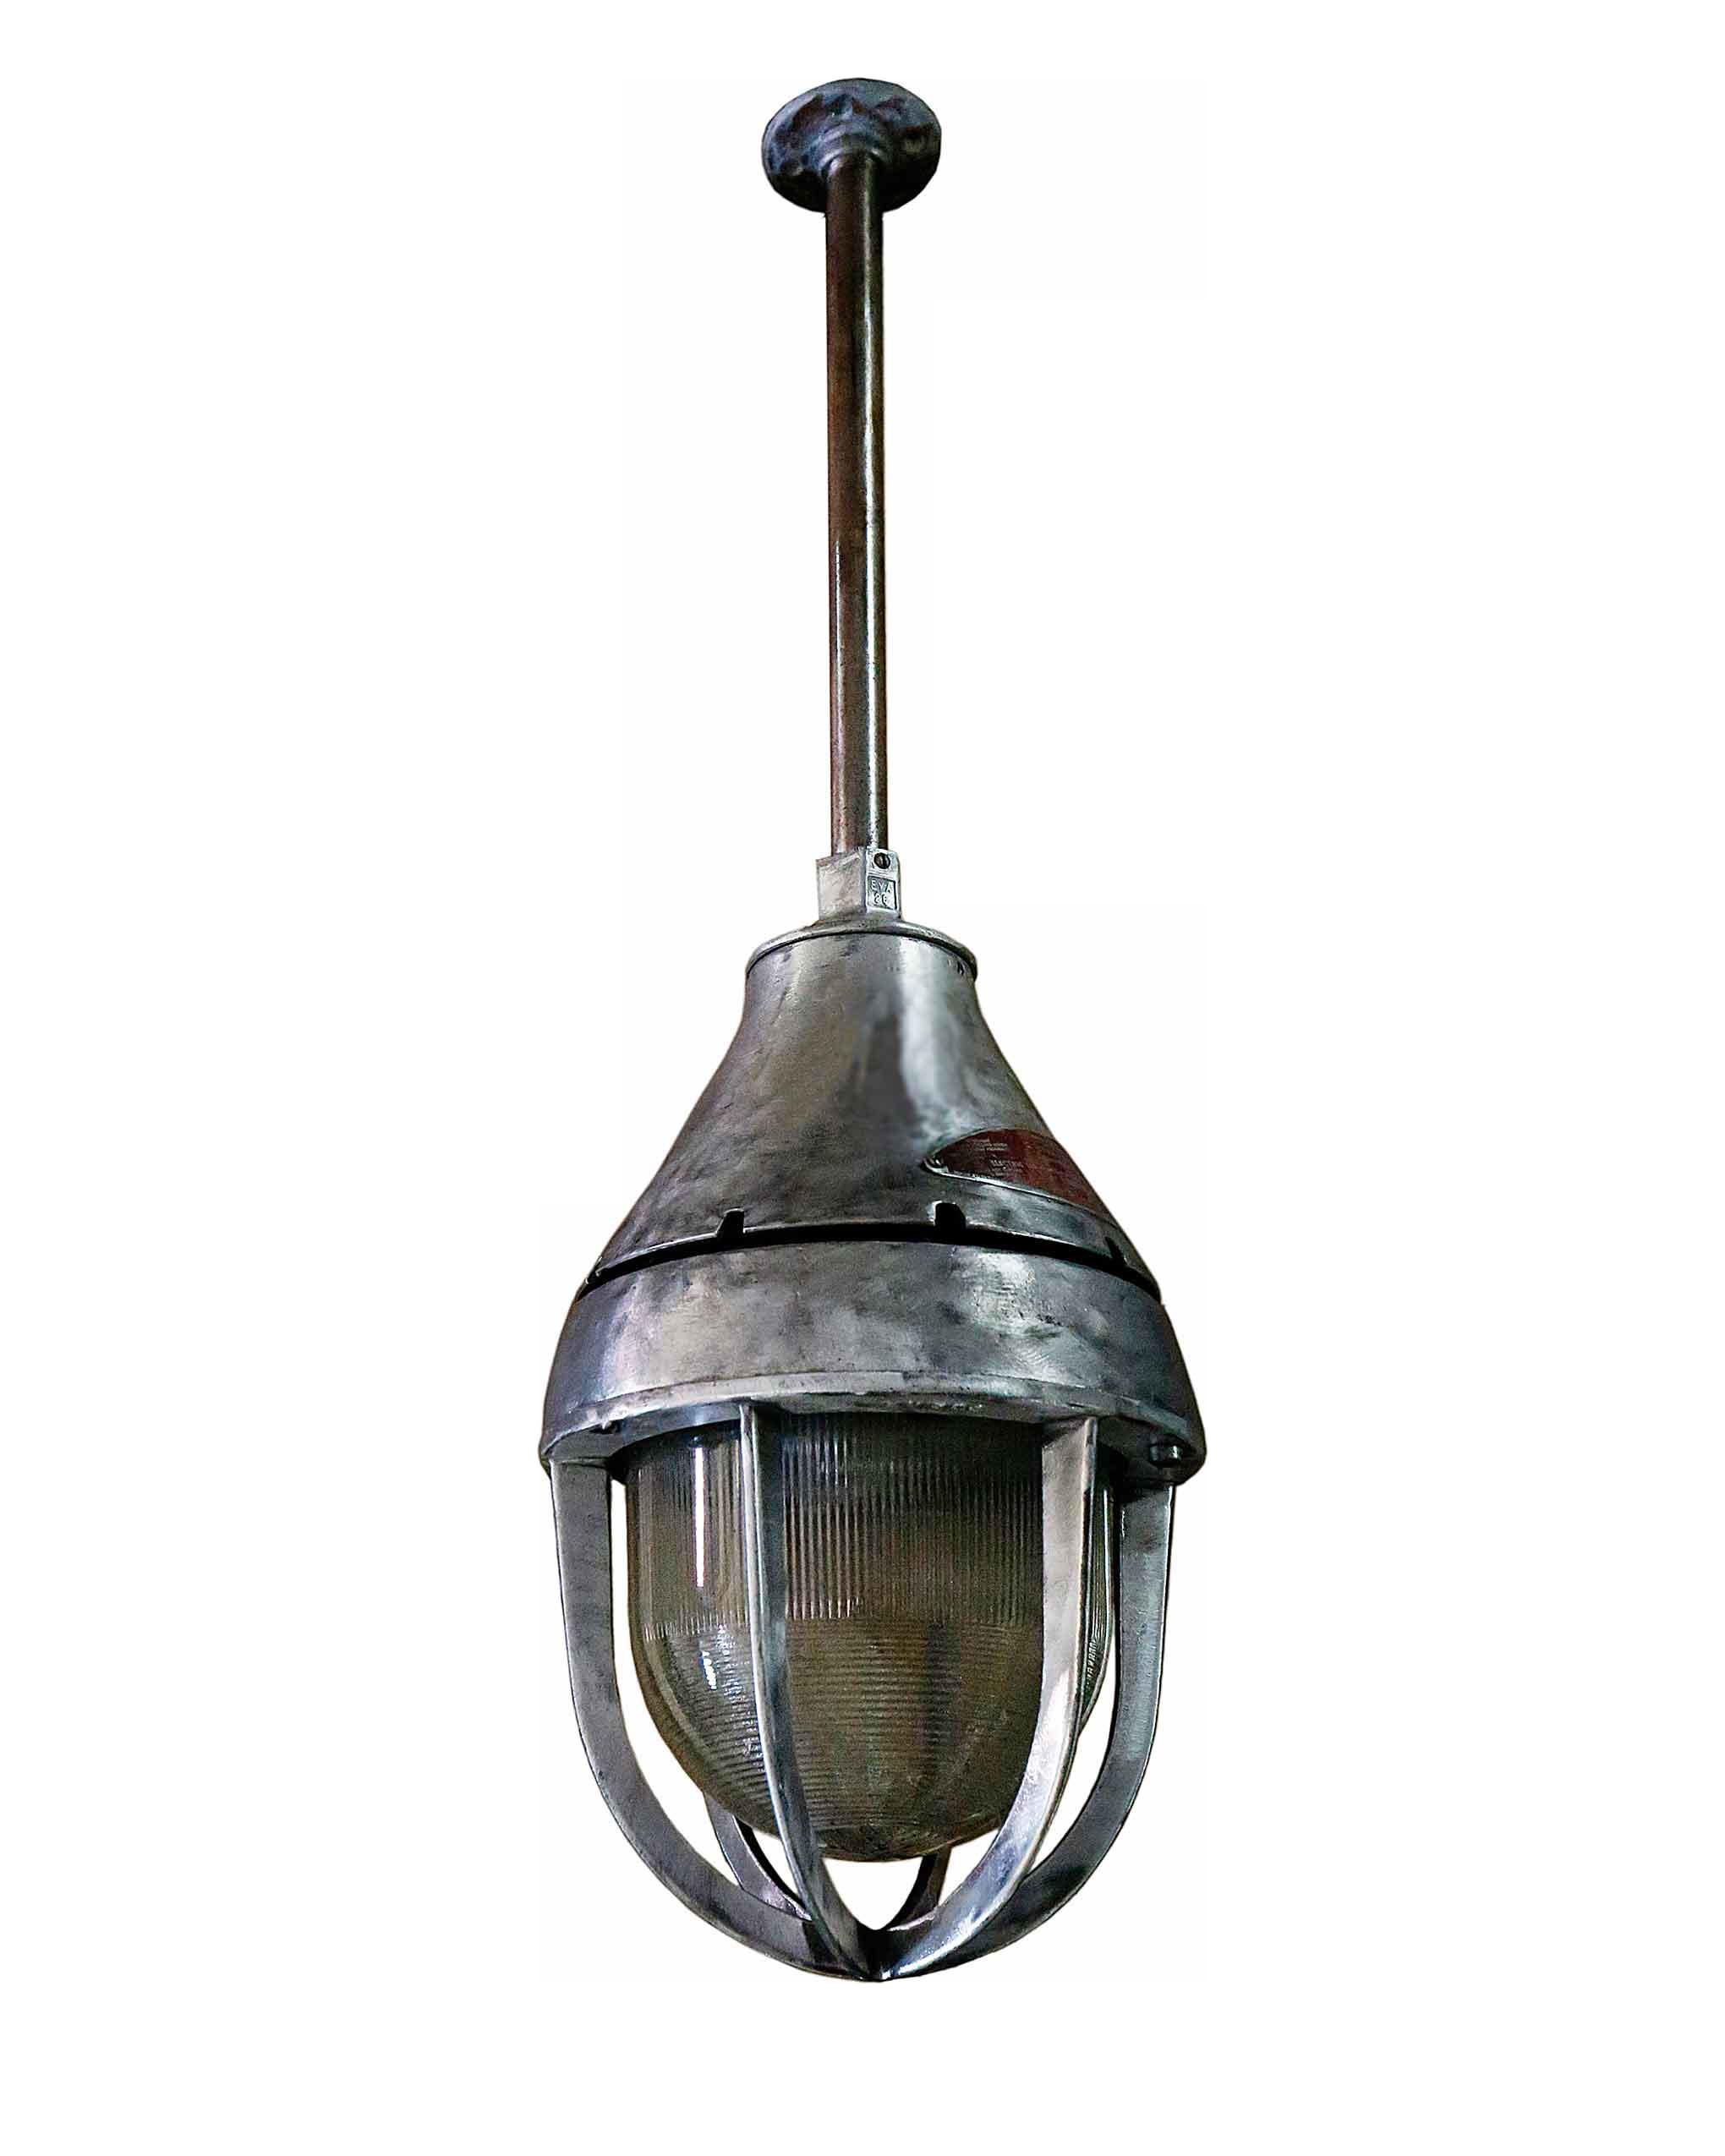 20th century industrial metal hanging light fixture chairish